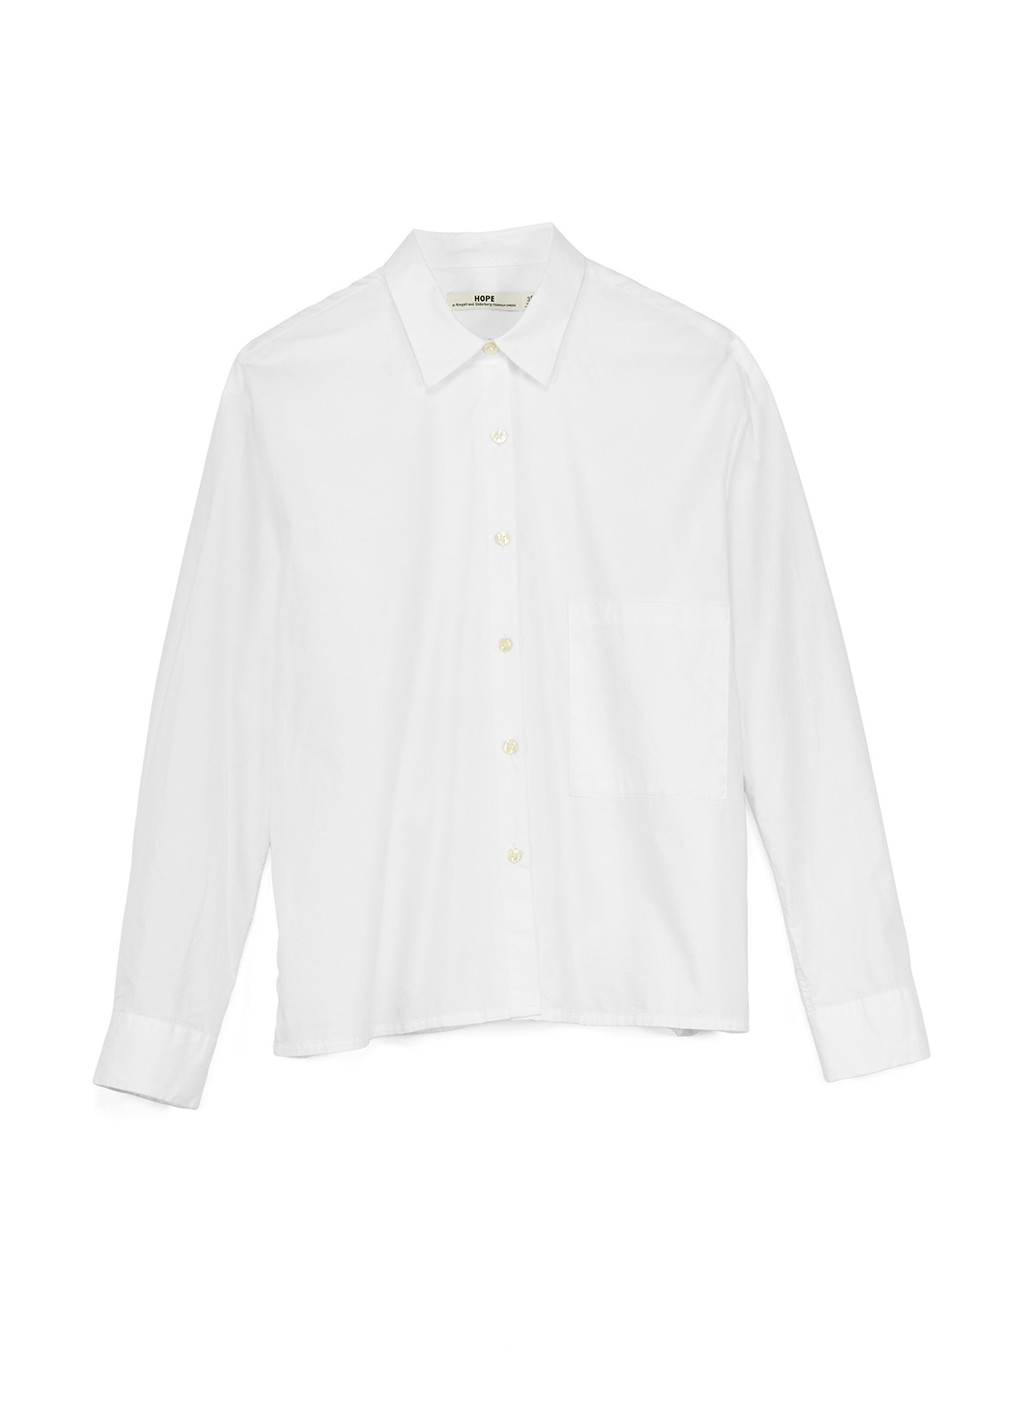 hope-ester-blouse-white-front